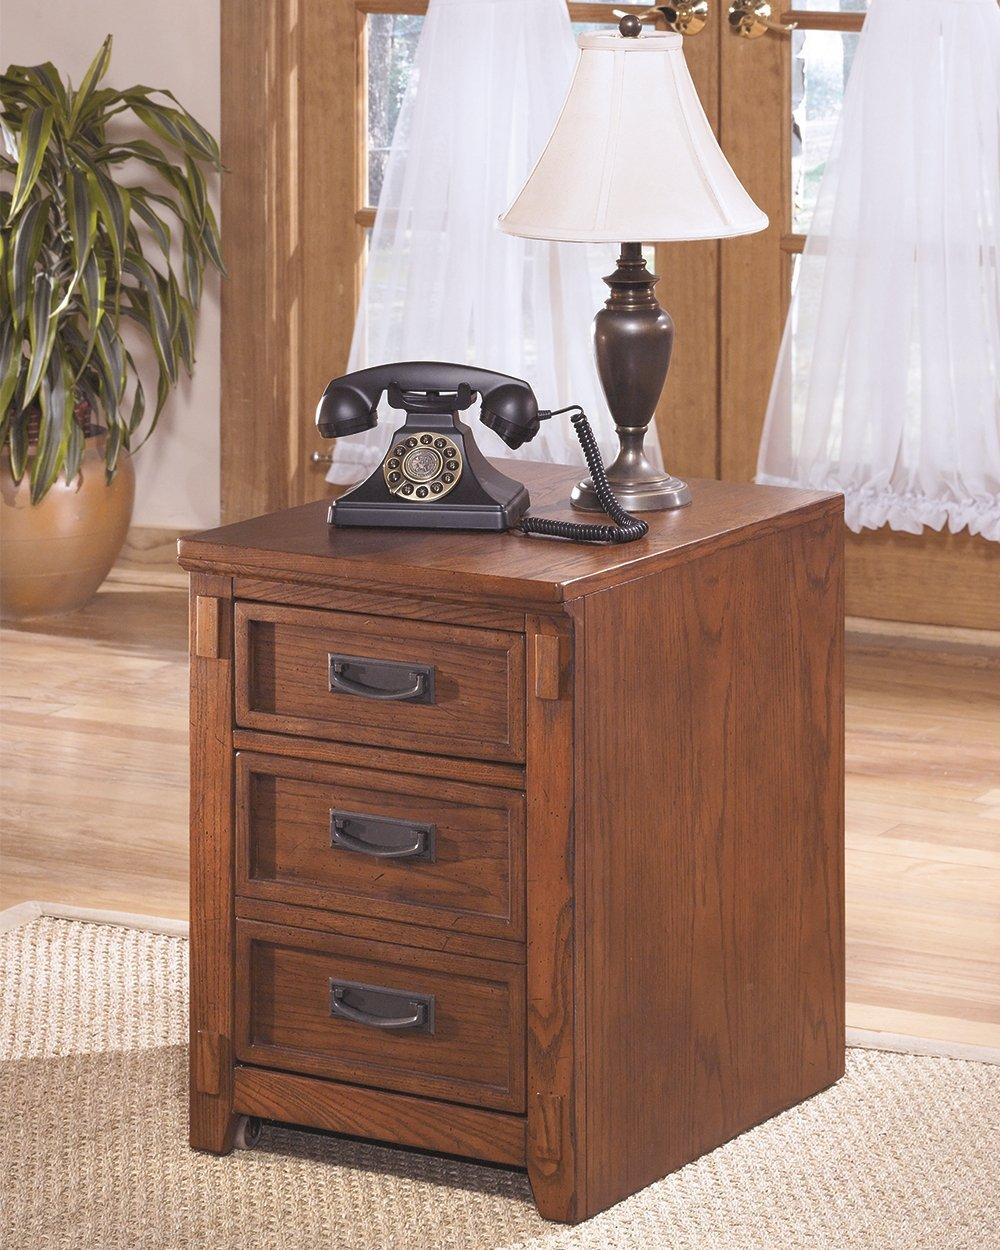 Ashley Furniture Signature Design - Cross Island File Cabinet - 1 Storage Drawer/1 File Drawer - Bronze-Tone Hardware - Medium Brown Finish H319-12